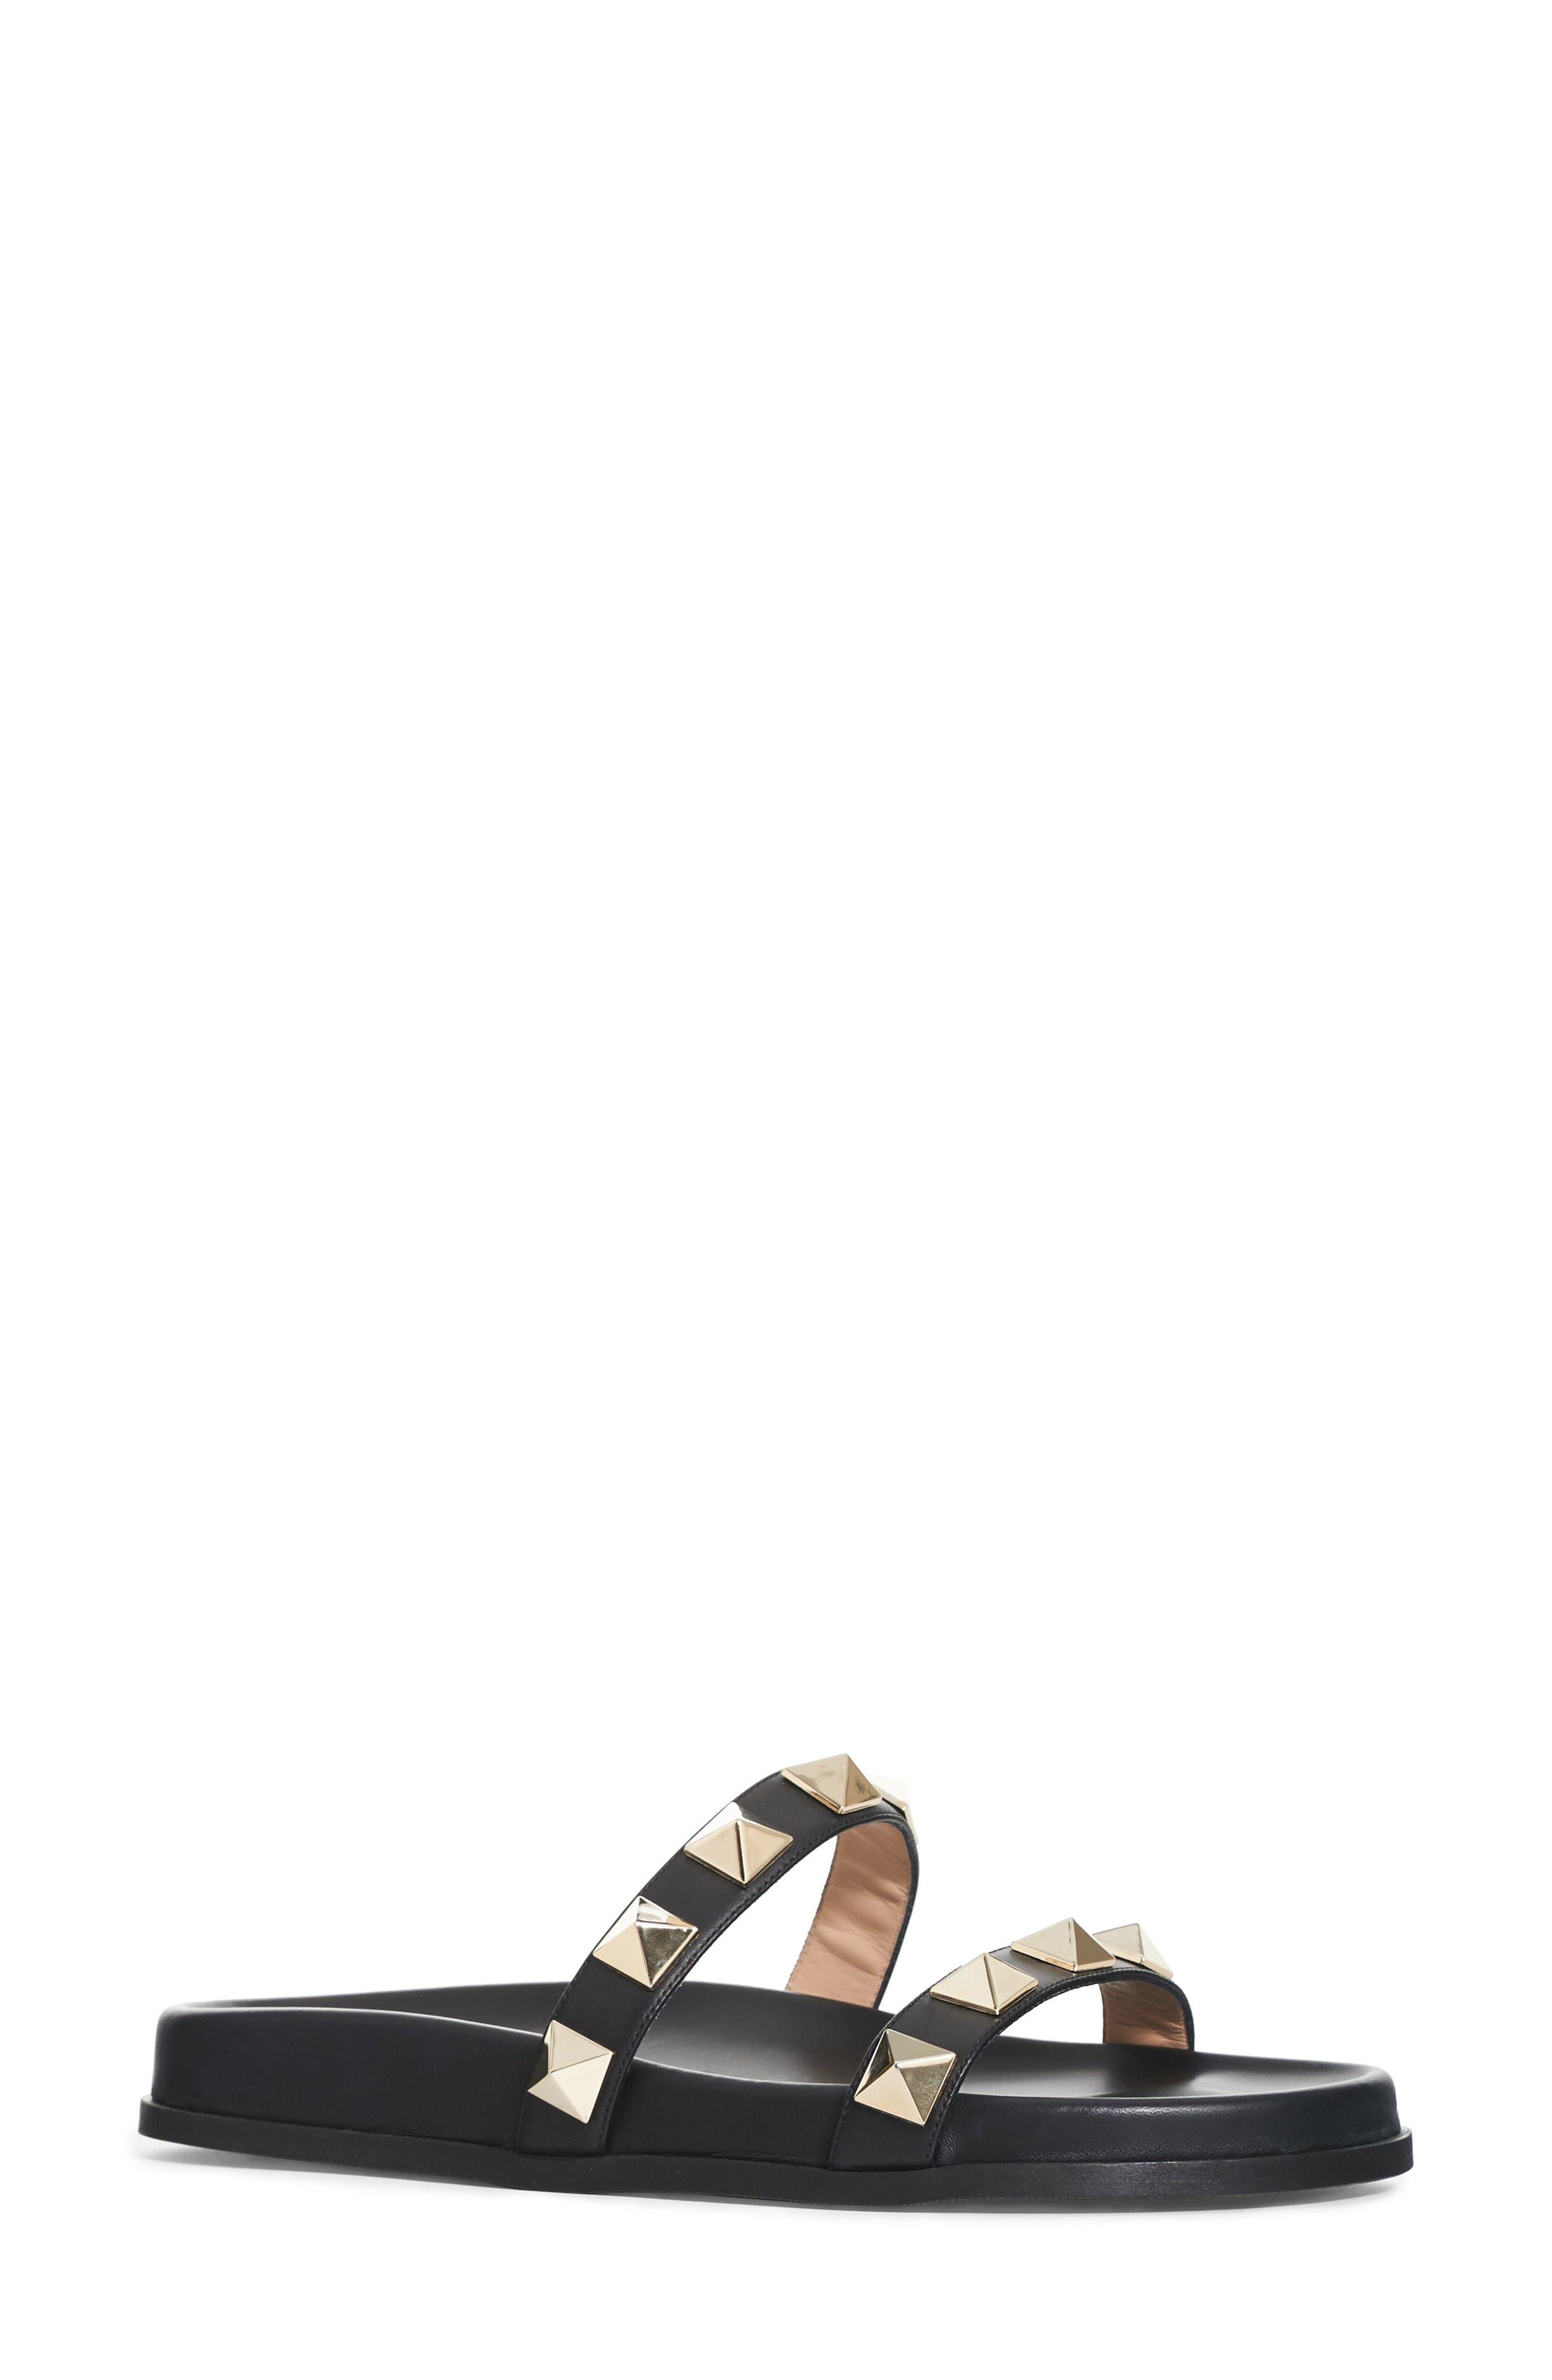 VALENTINO GARAVANI Rockstud Lock Slide Sandal (Women)